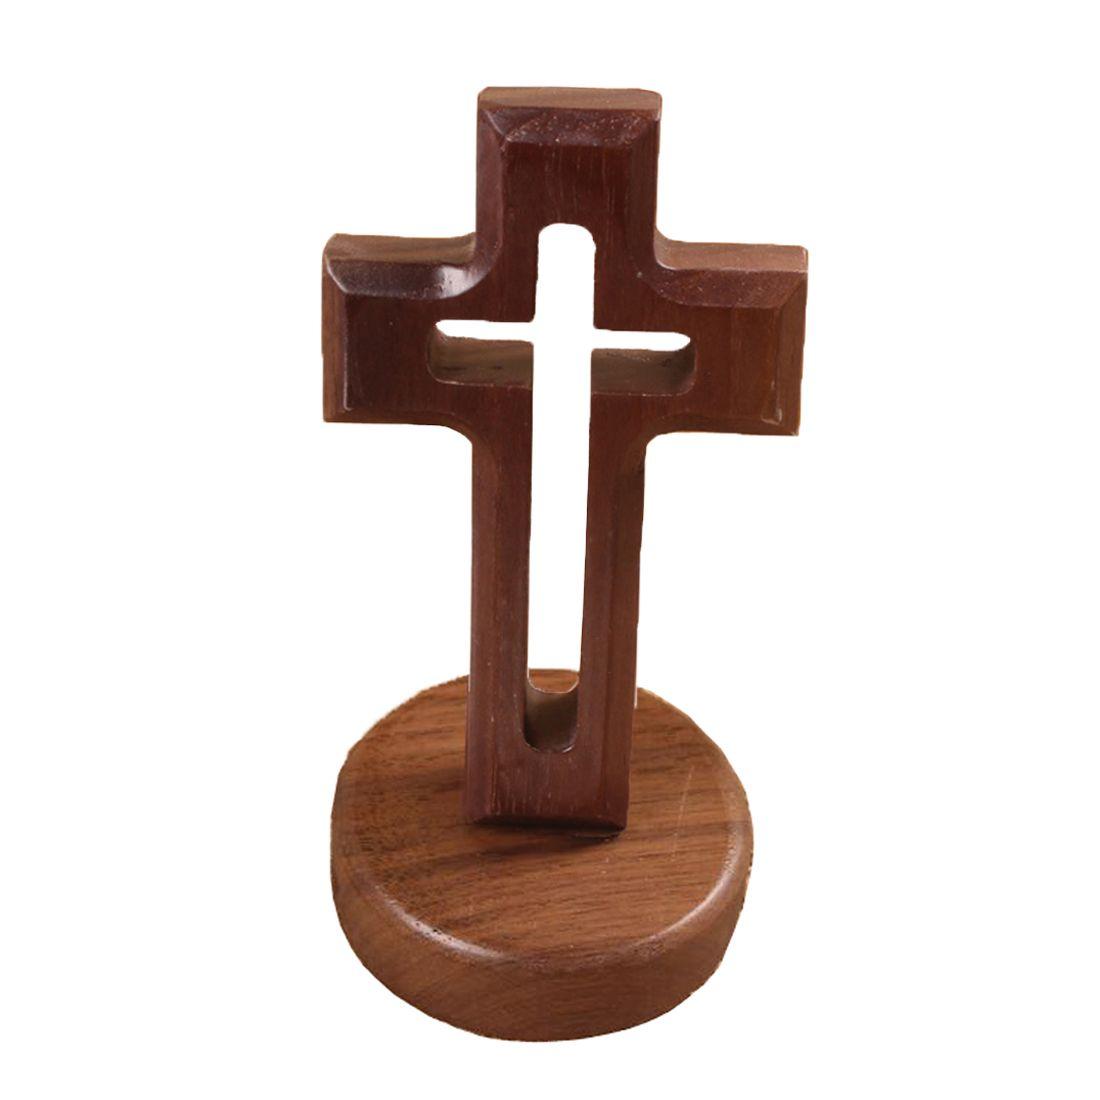 Charmant 2018 Bairuiou Wooden Cross Standing Hand Made Ornaments Jesus Christian  Church Decoration Desktop Tabletop Artcrafr For Home Decor From Bairuiou,  ...